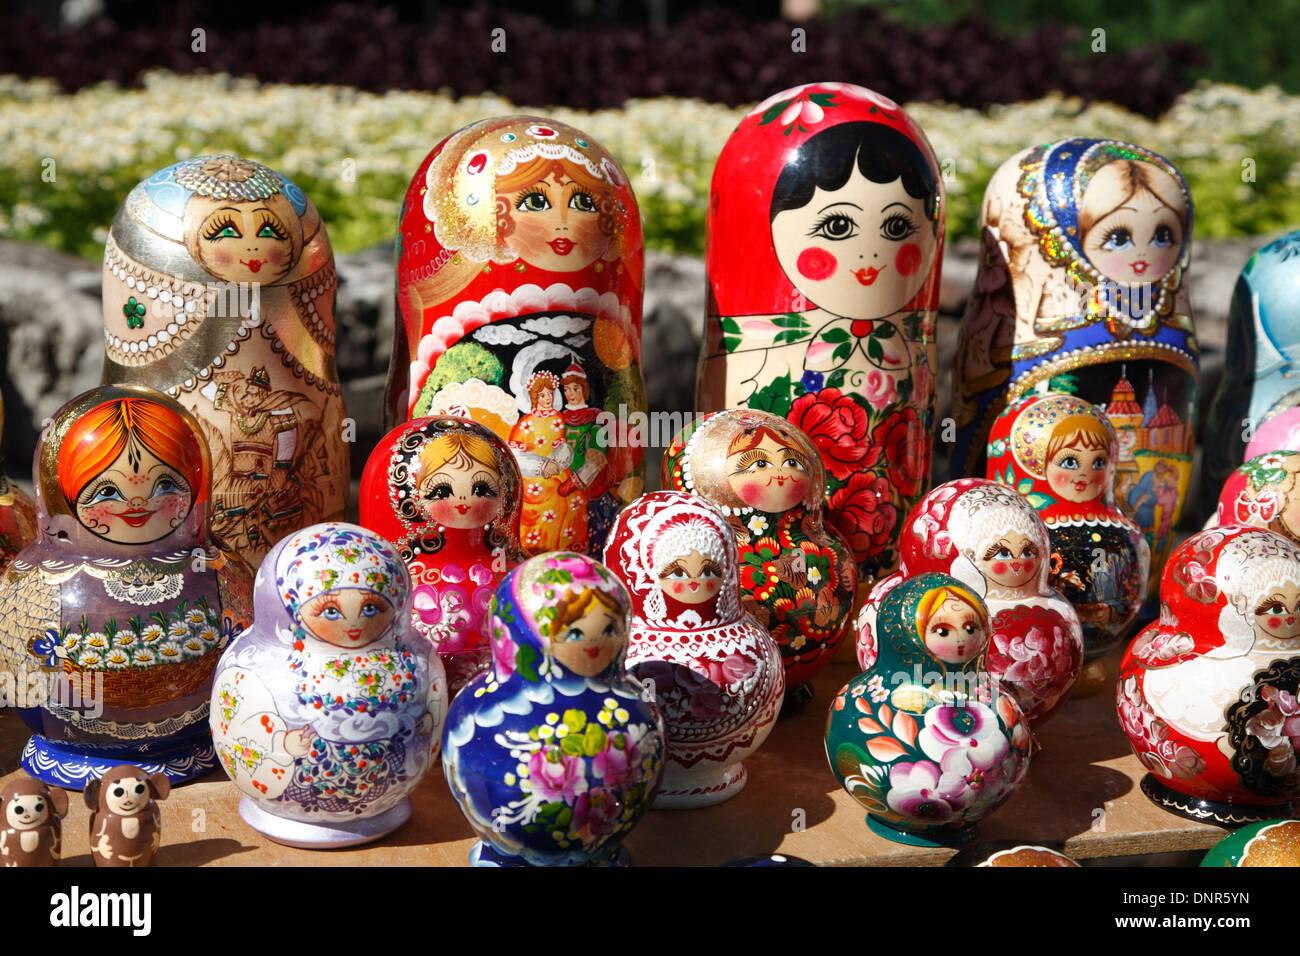 Souvenirs,  Matroschka Puppen, Russian nesting dolls, Riga, Latvia, Europe Stock Photo